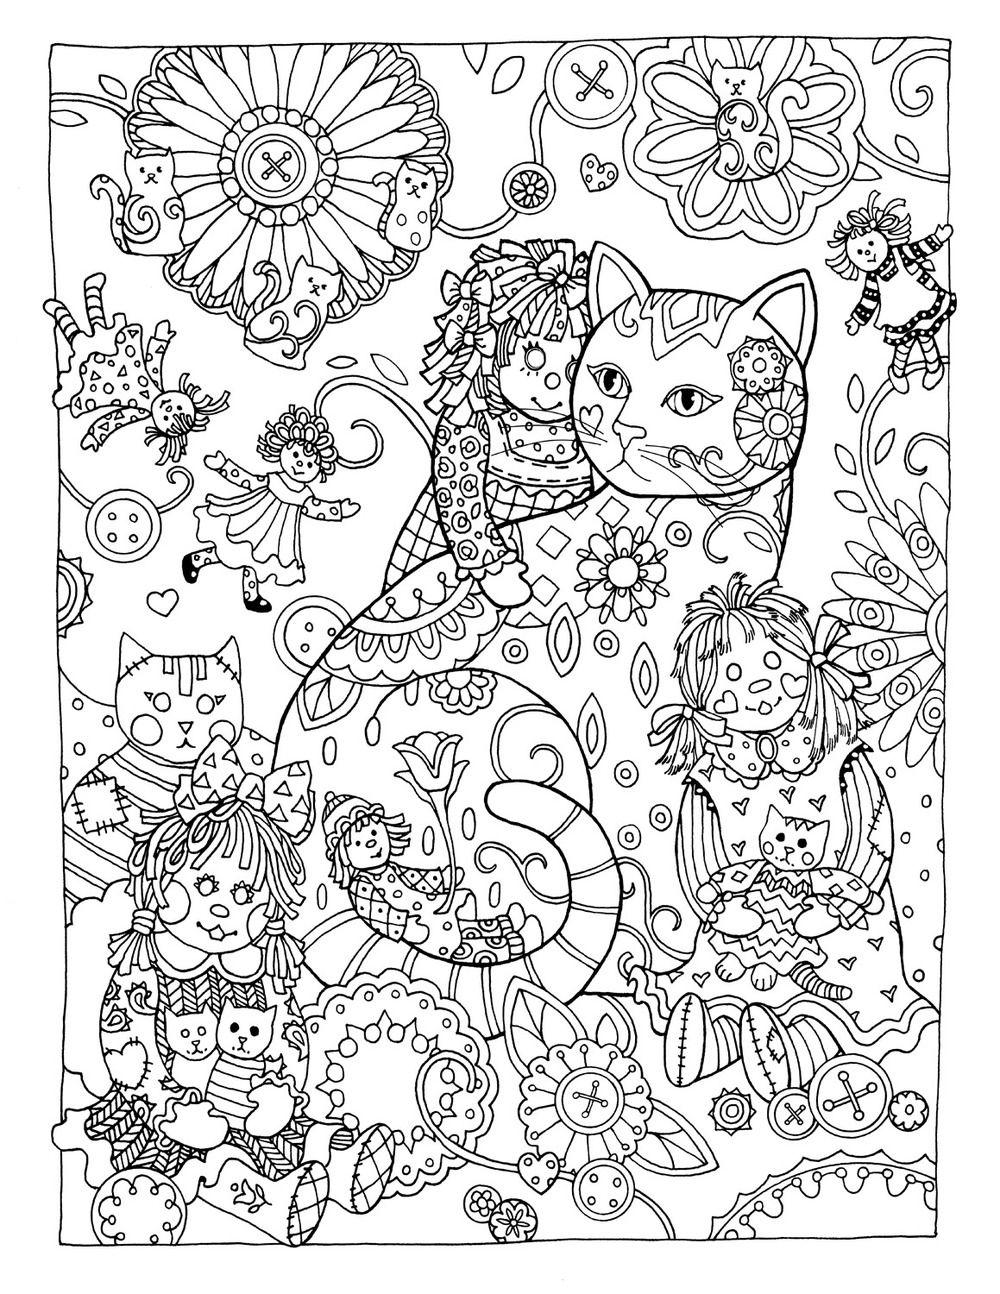 Creative cats colouring book ragdolls by marjorie sarnat katter